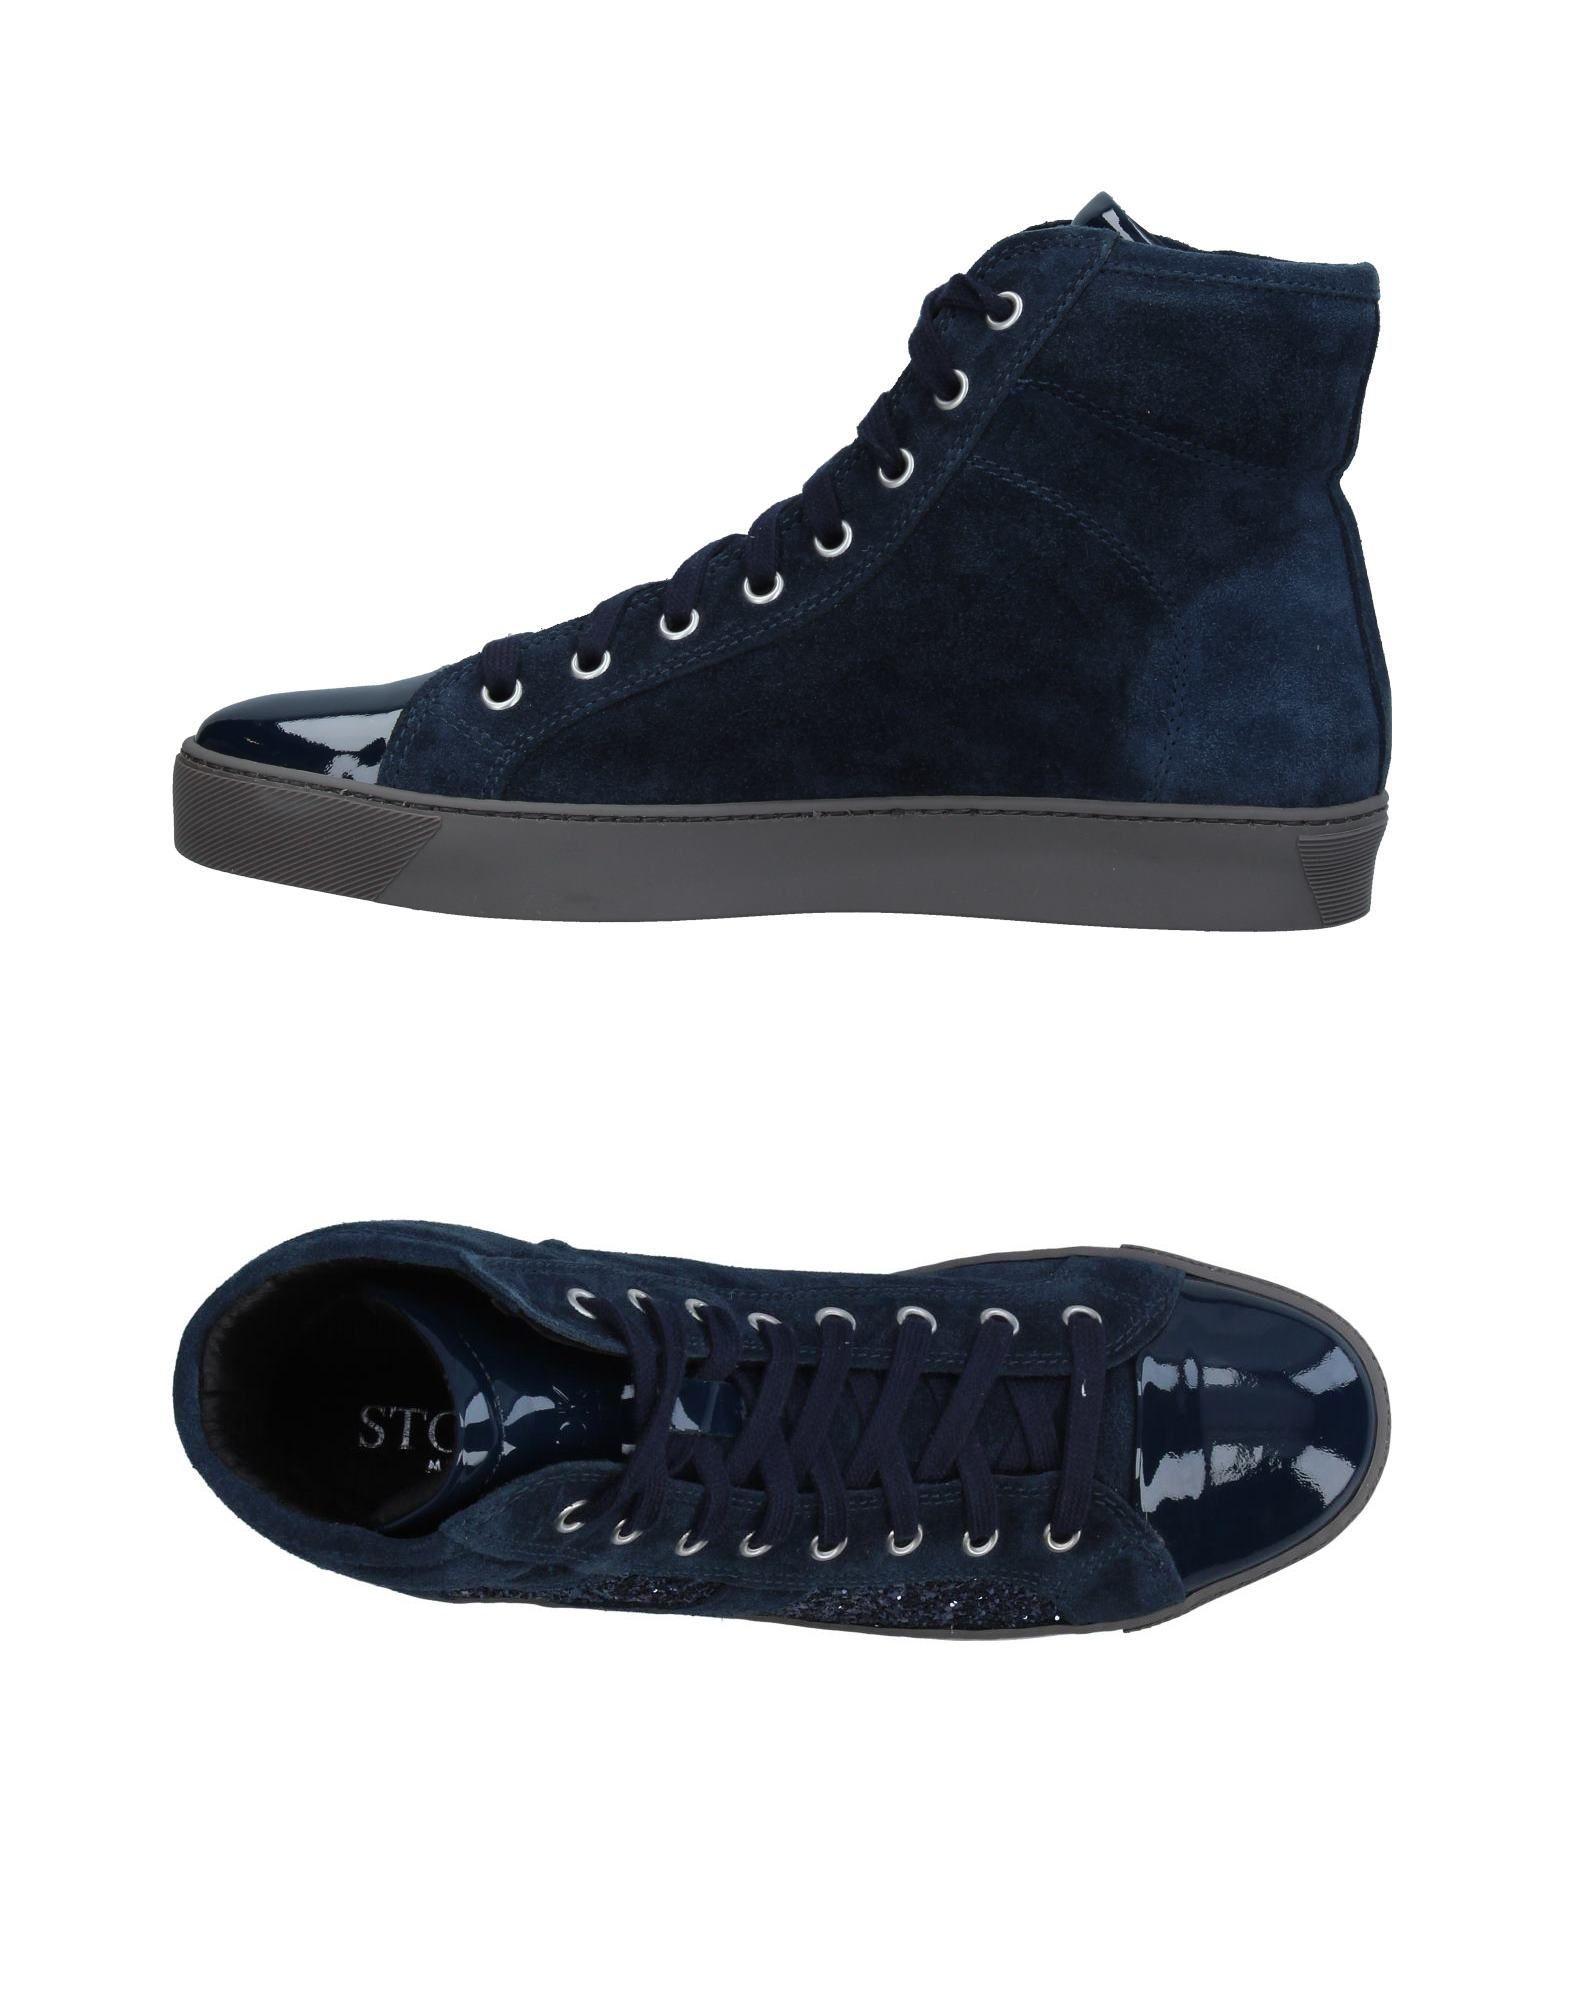 Stokton 11366267XE Sneakers Damen  11366267XE Stokton Gute Qualität beliebte Schuhe c49c04